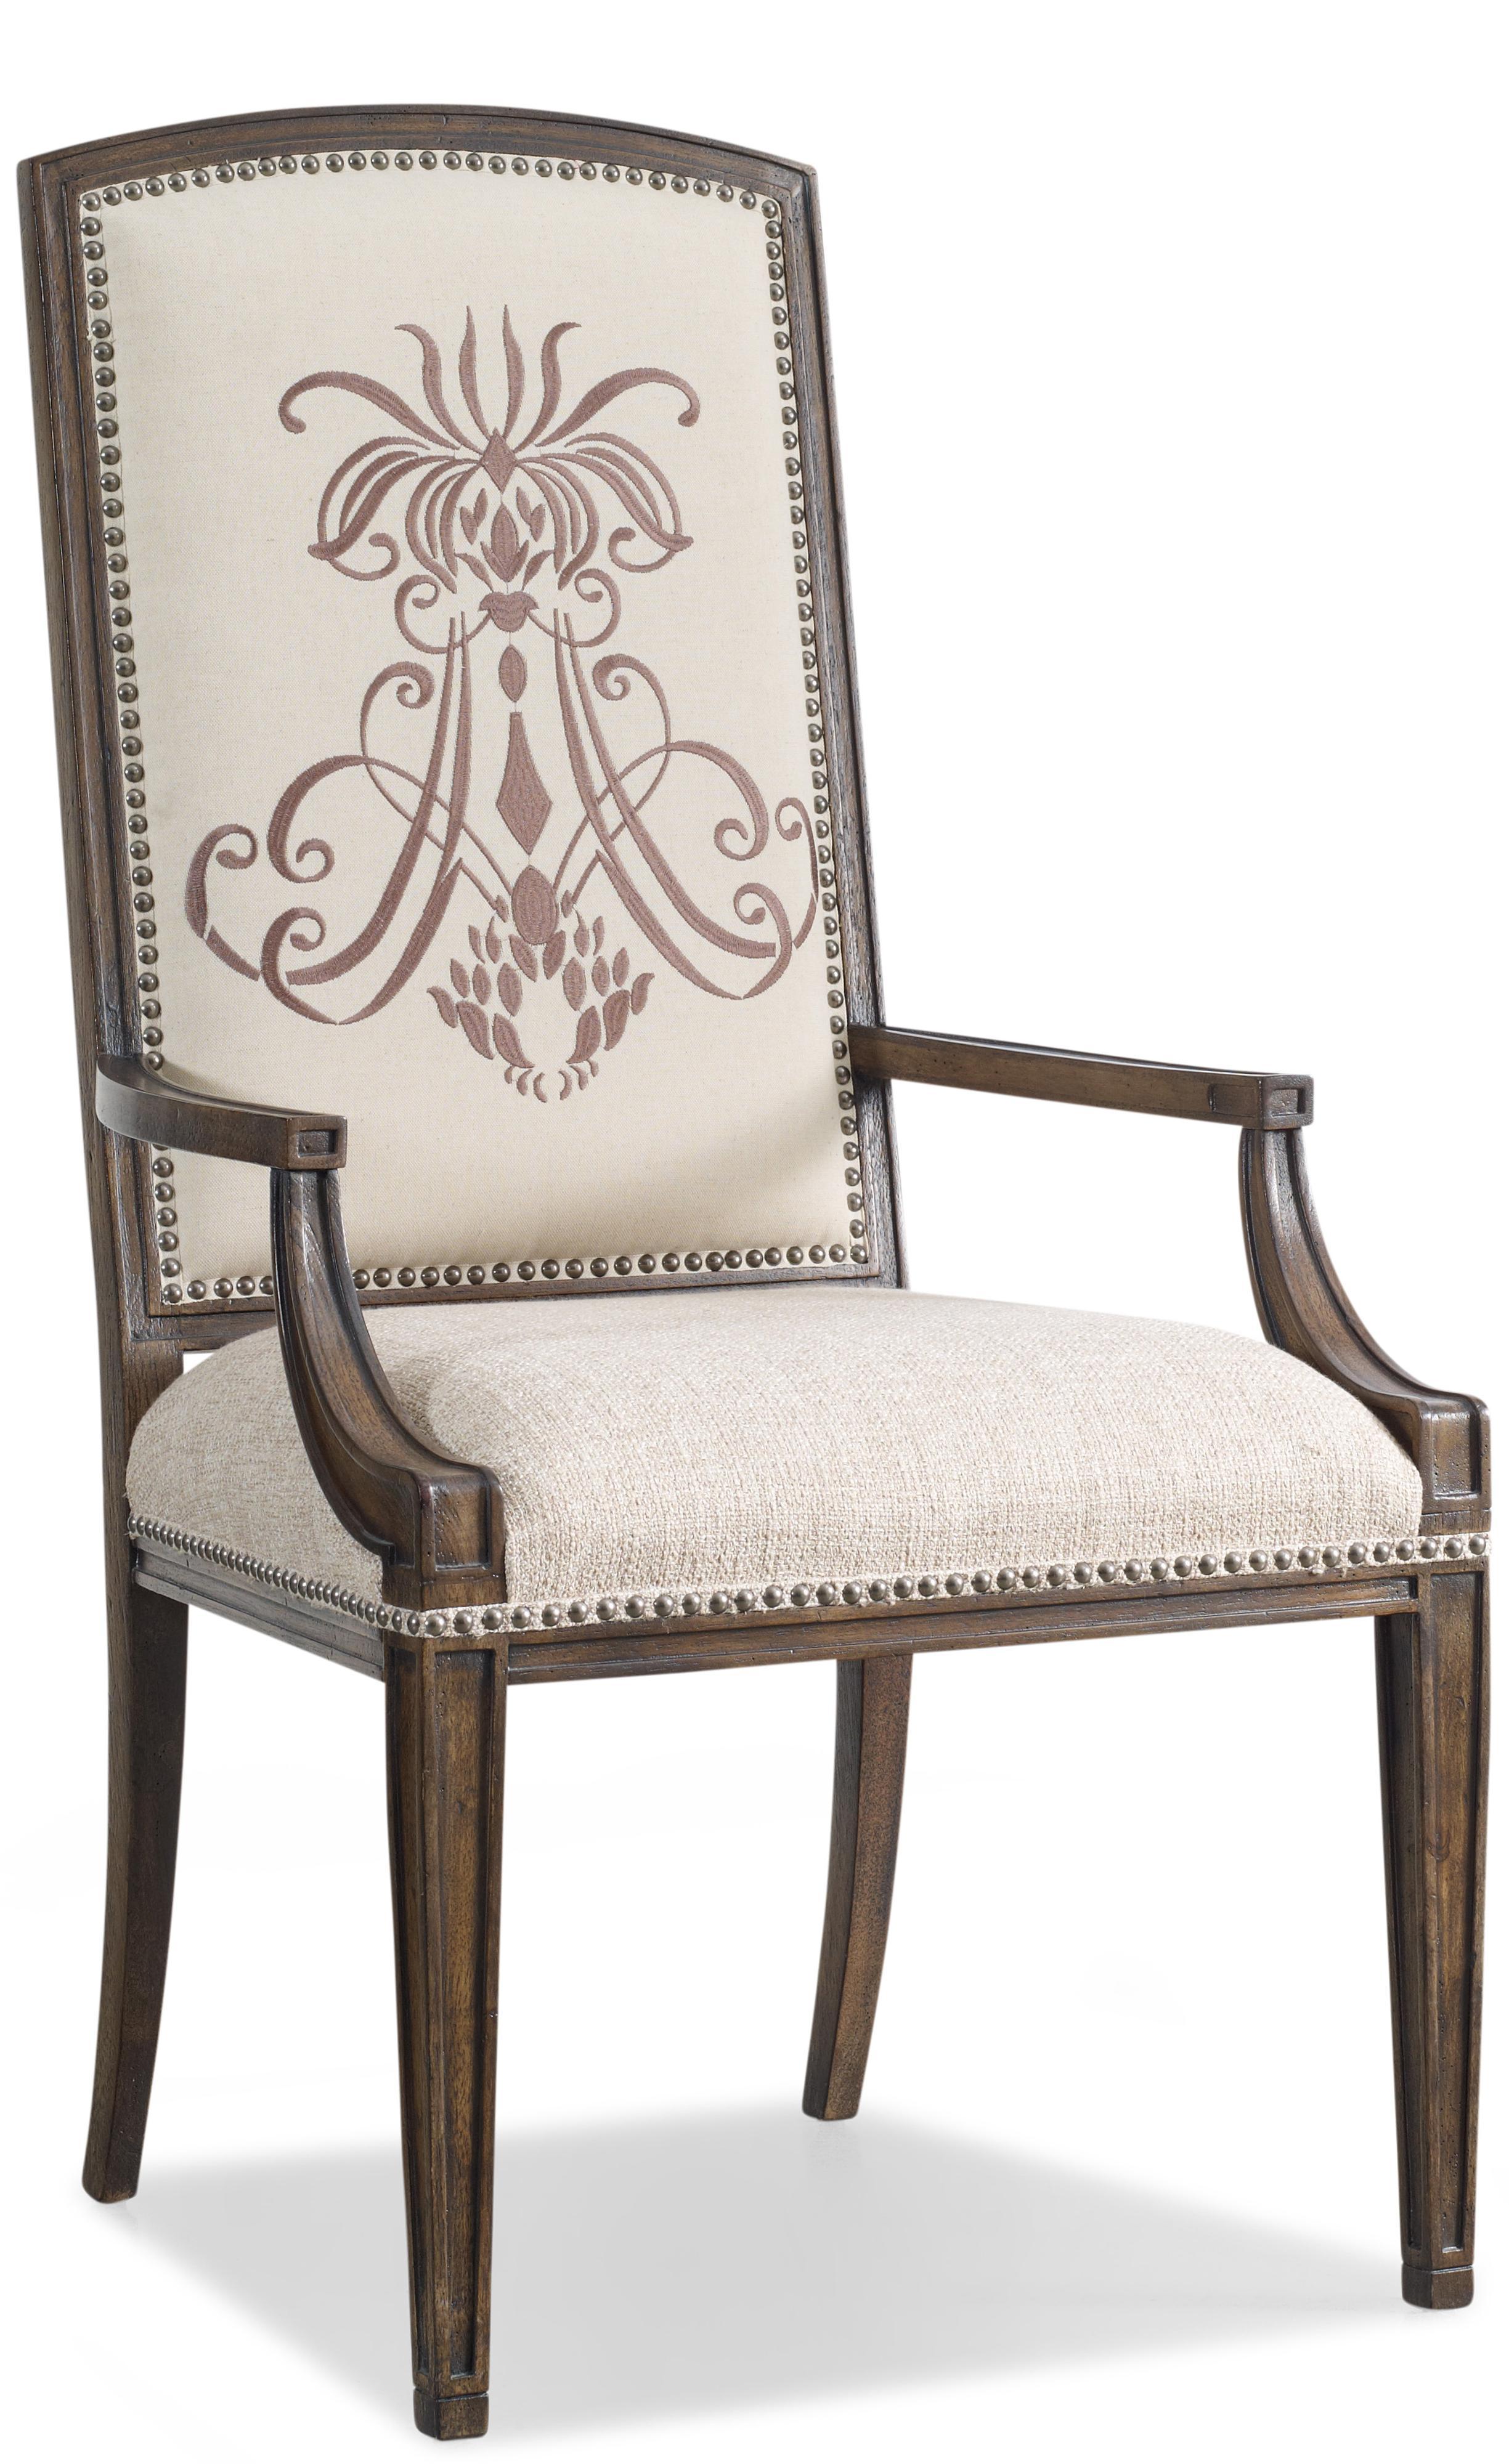 Rhapsody Insignia Arm Chair by Hooker Furniture at Belfort Furniture